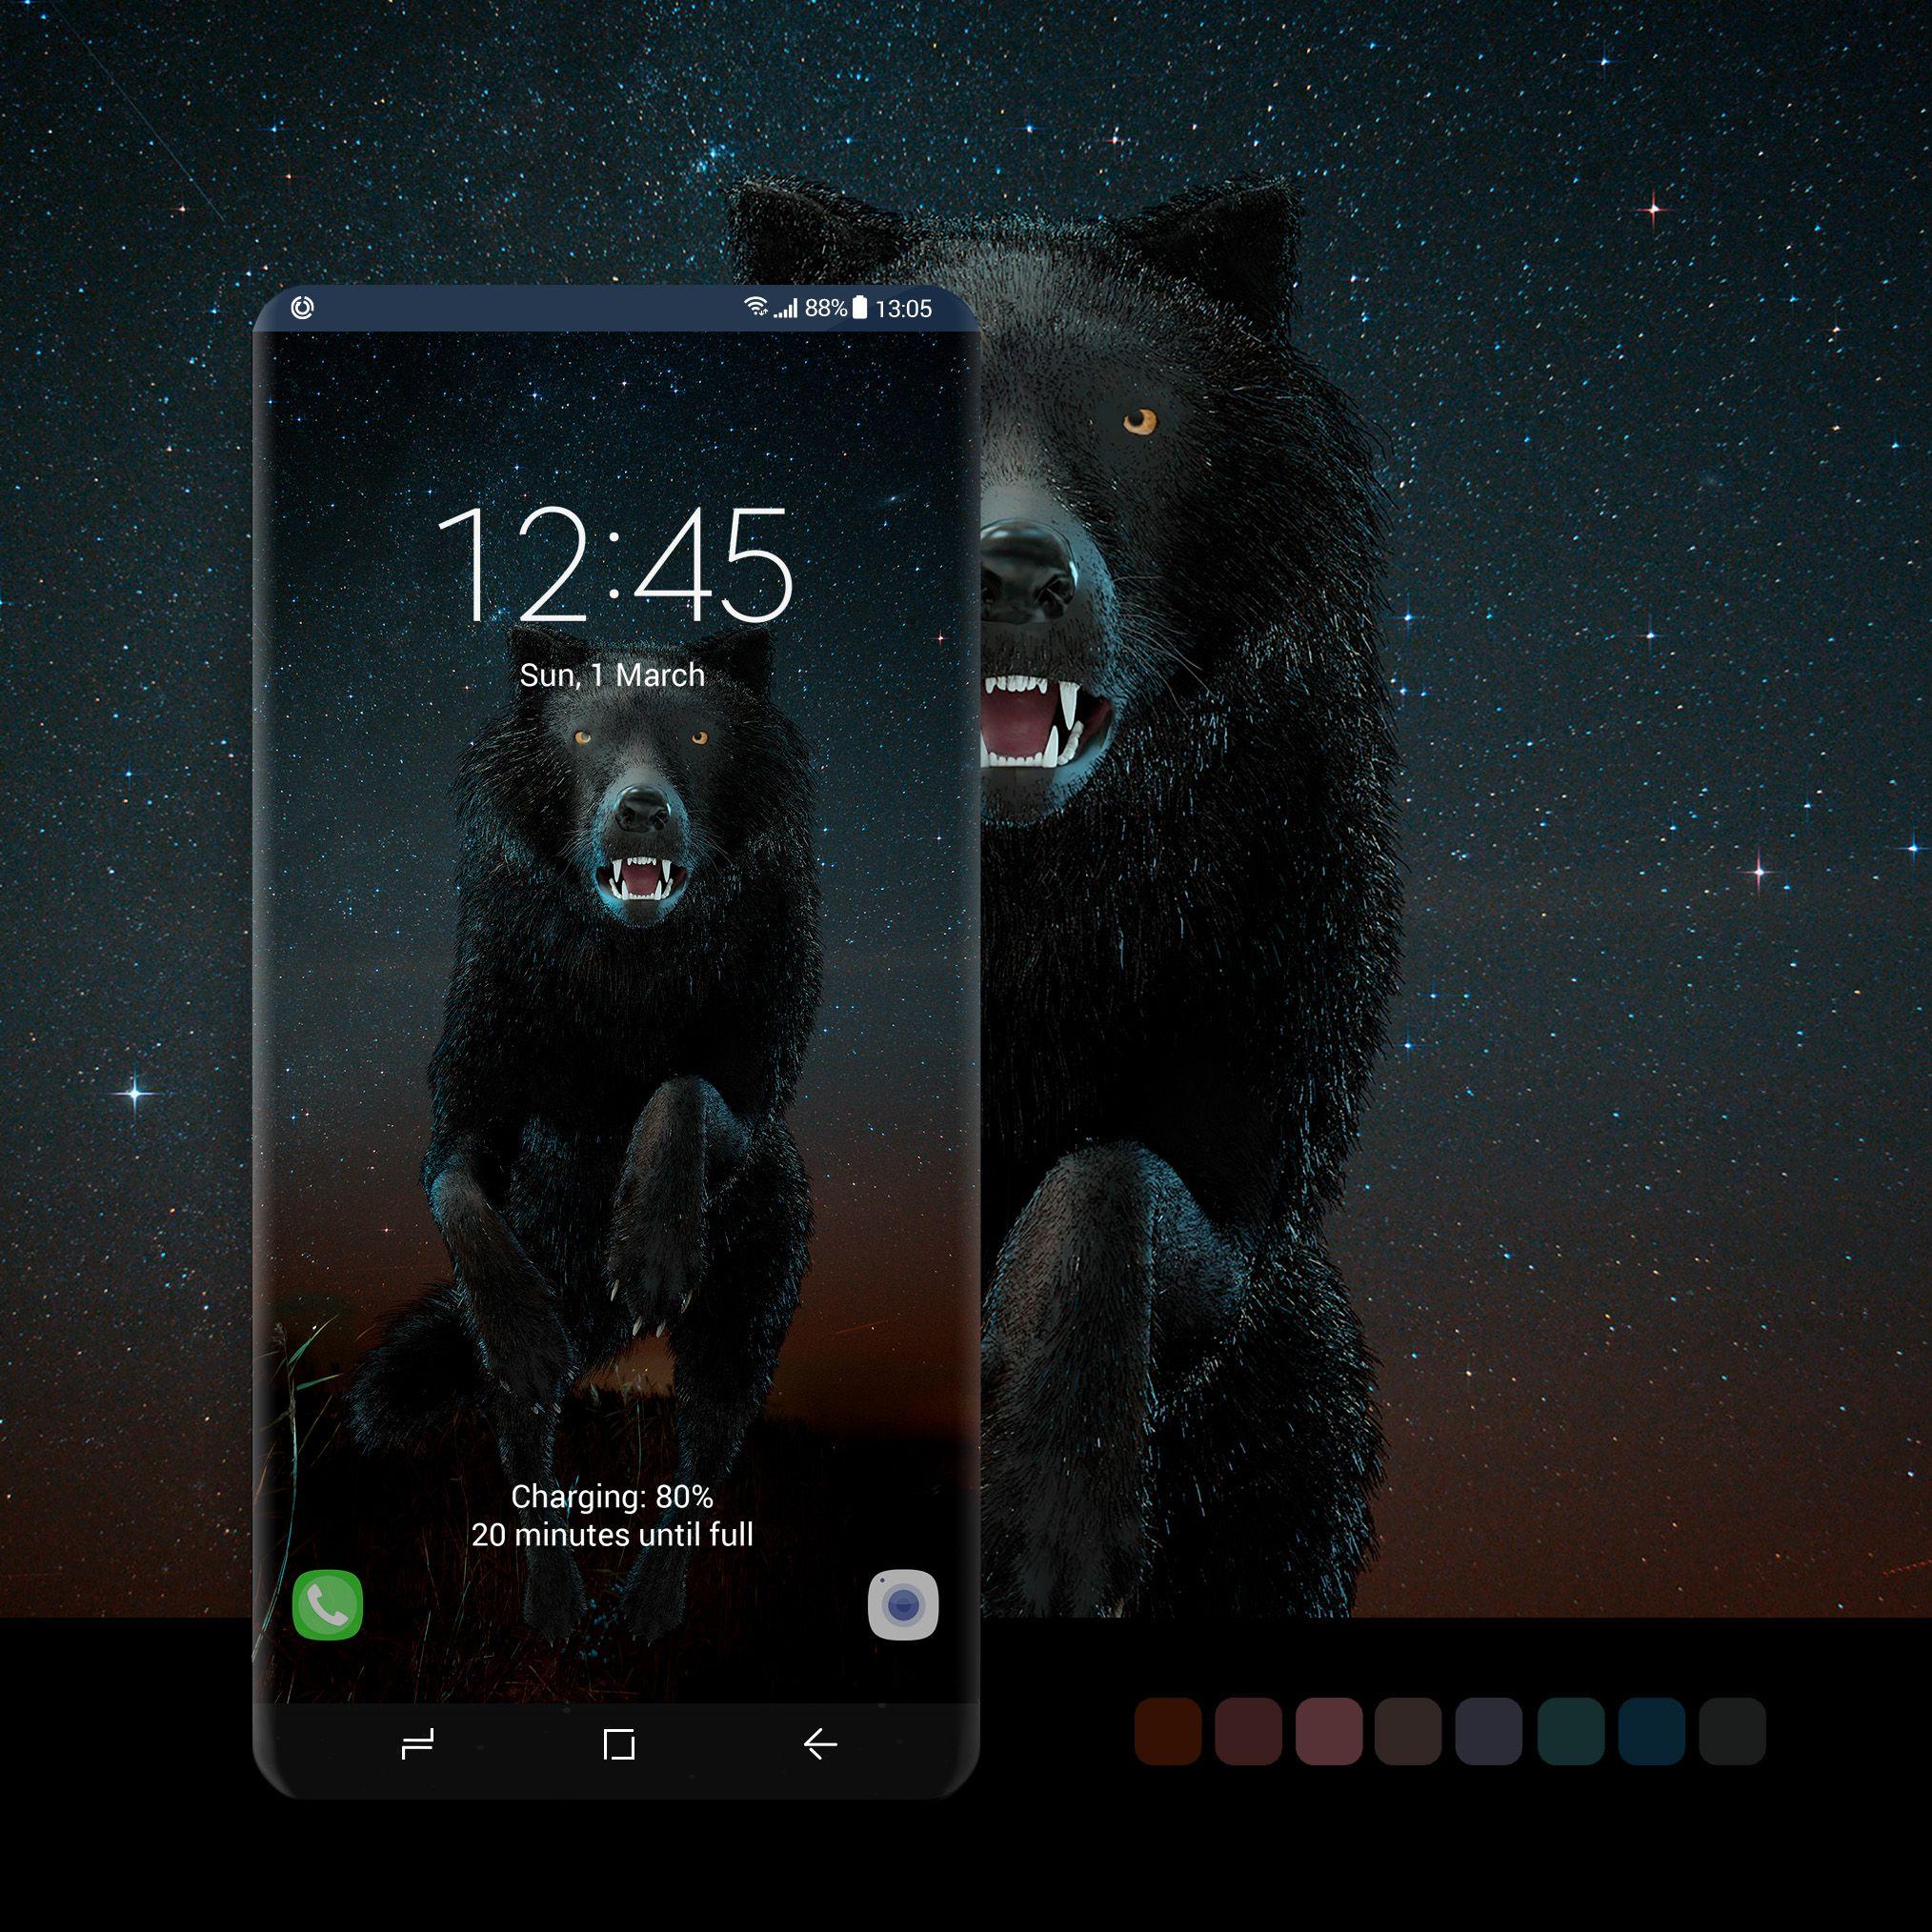 Pin By Zeru On My Saves Samsung Wallpaper Samsung Galaxy Wallpaper Wolf Wallpaper